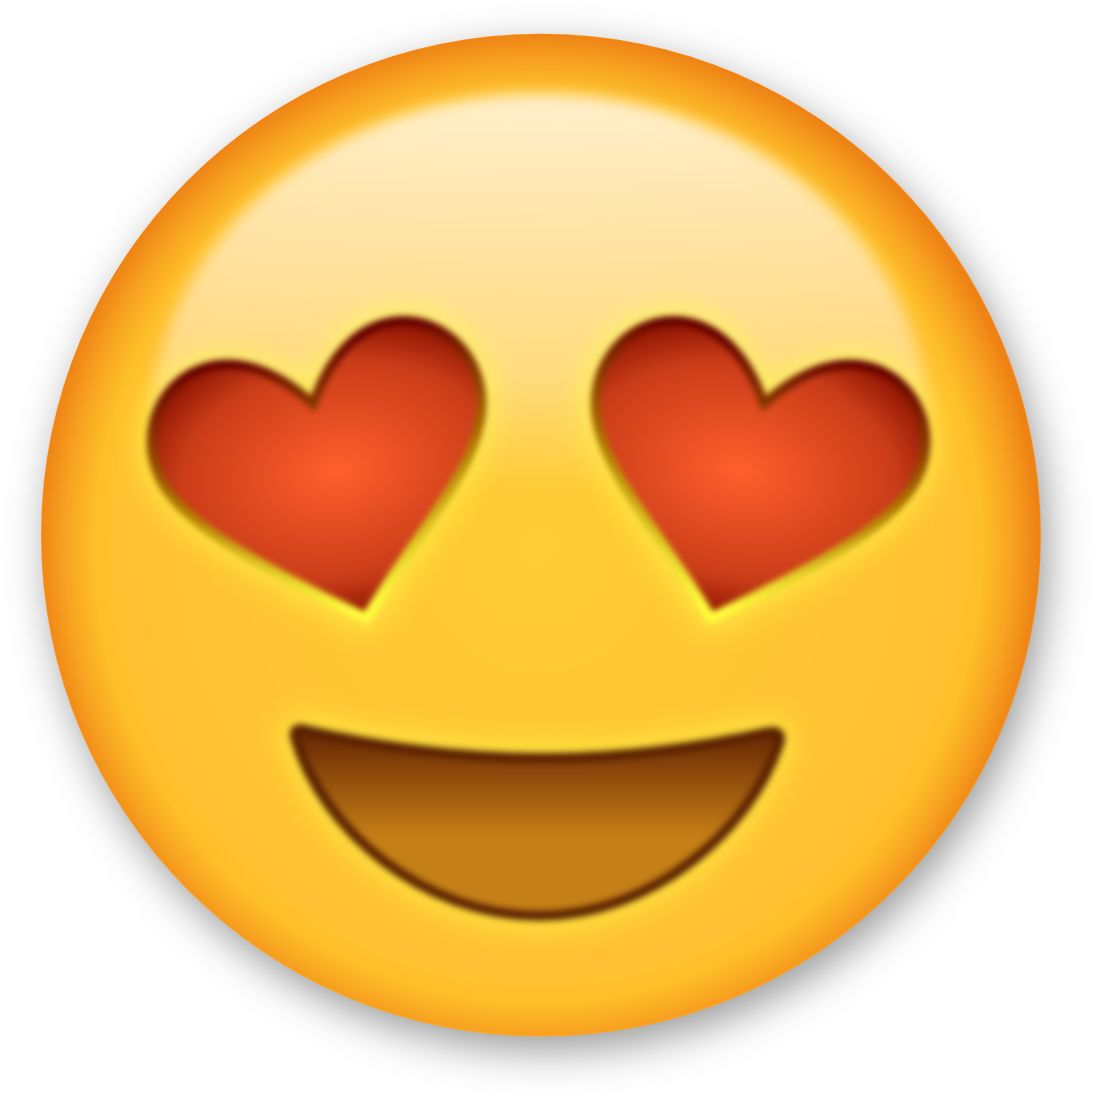 Running Emoji Clipart - Clipart Kid